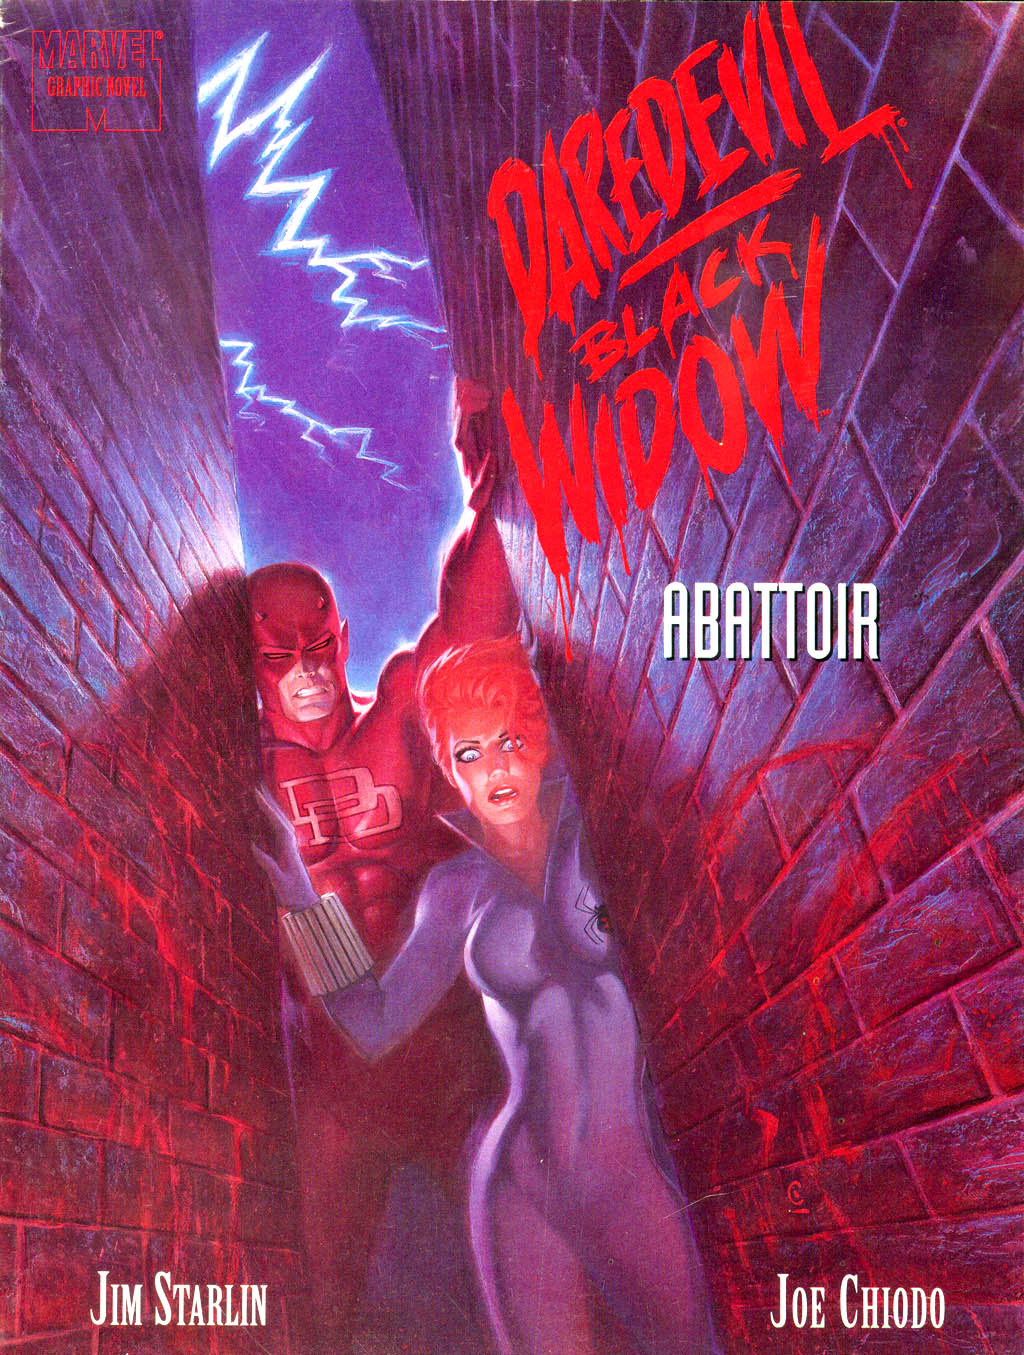 Marvel Graphic Novel 75_-_Daredevil_Black_Widow_-_Abattoir Page 1